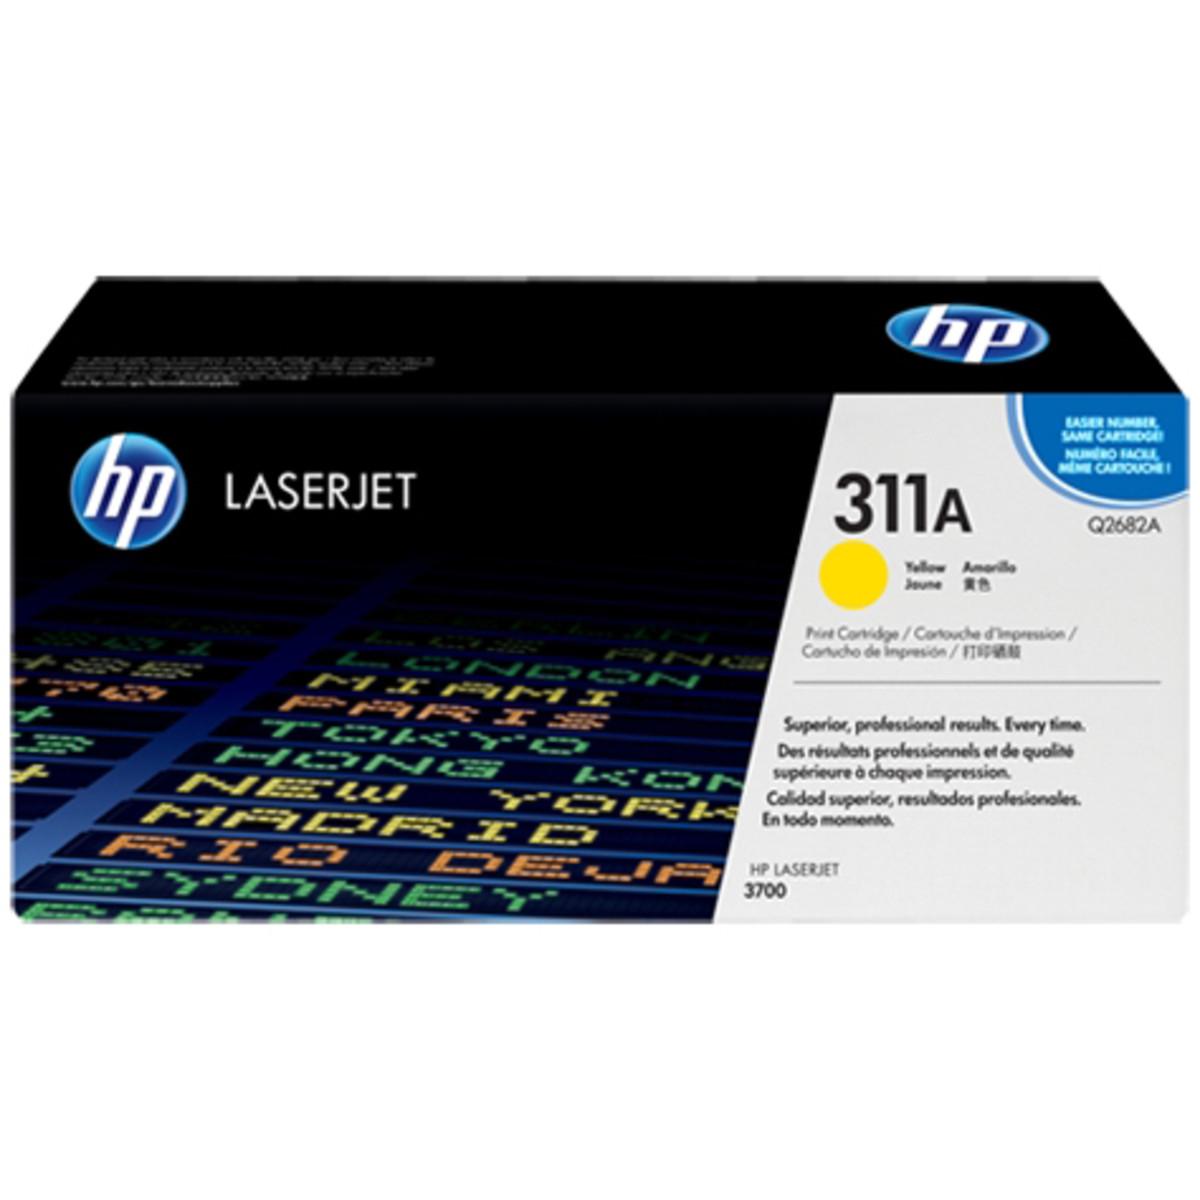 HP 311A (Q2682A) Yellow Toner Cartridge